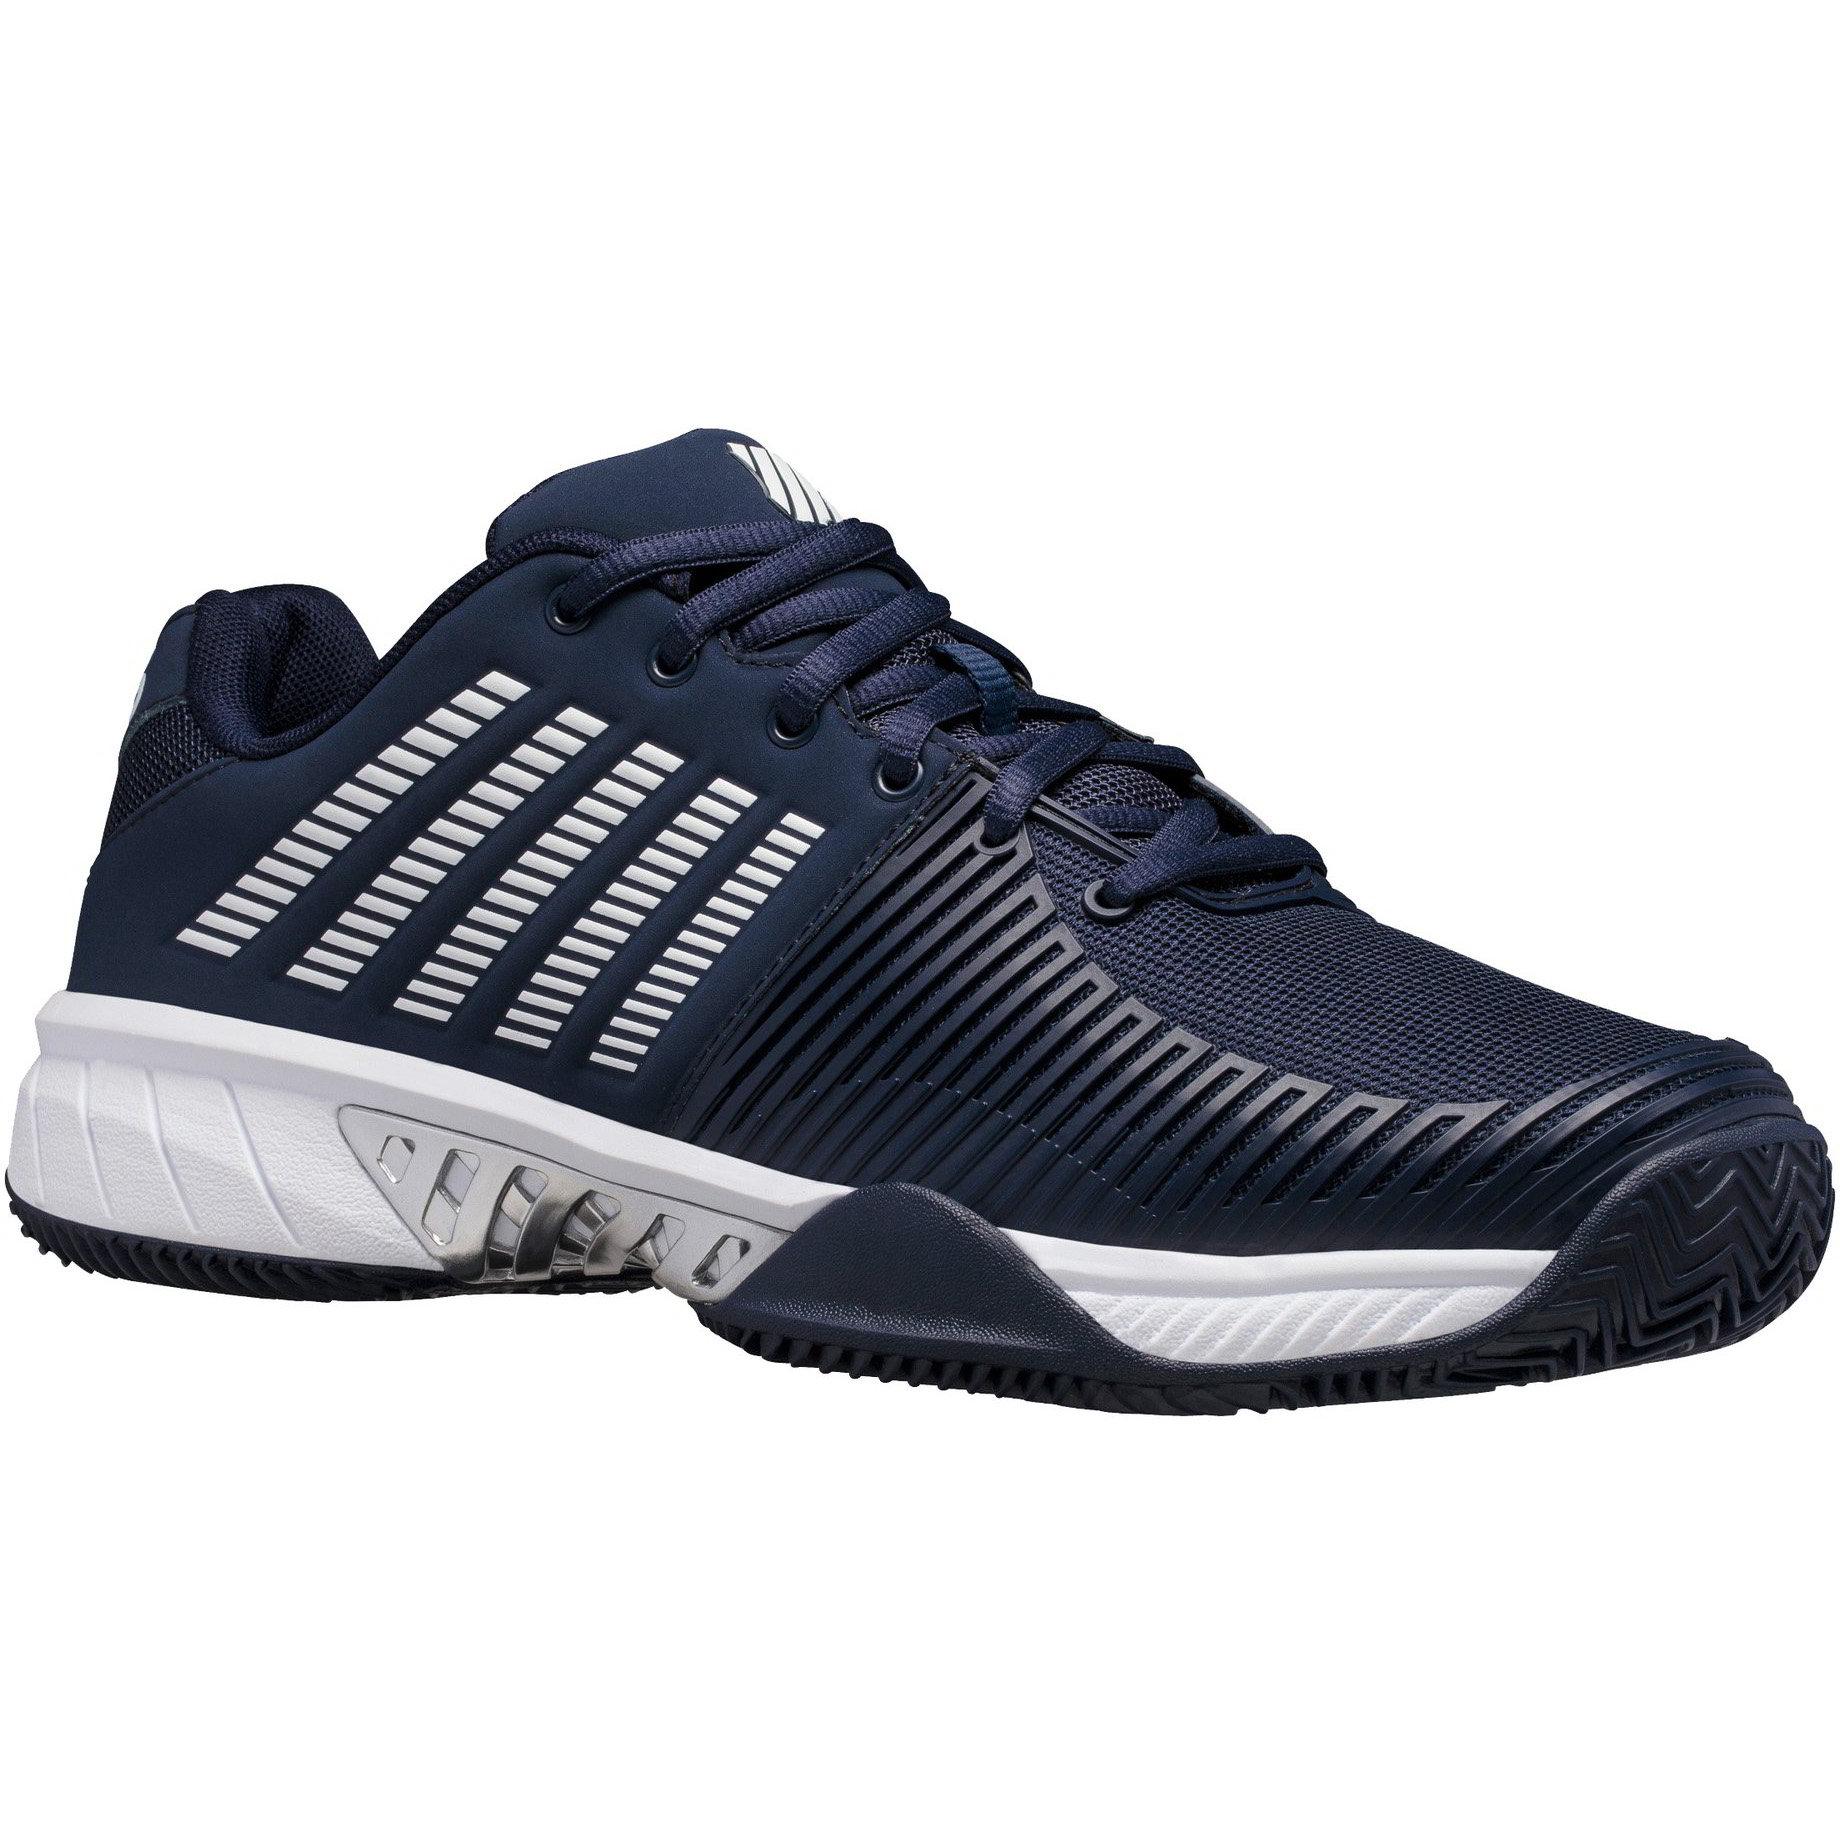 K-Swiss Mens Express Light 2 HB Tennis Shoes - Navy White